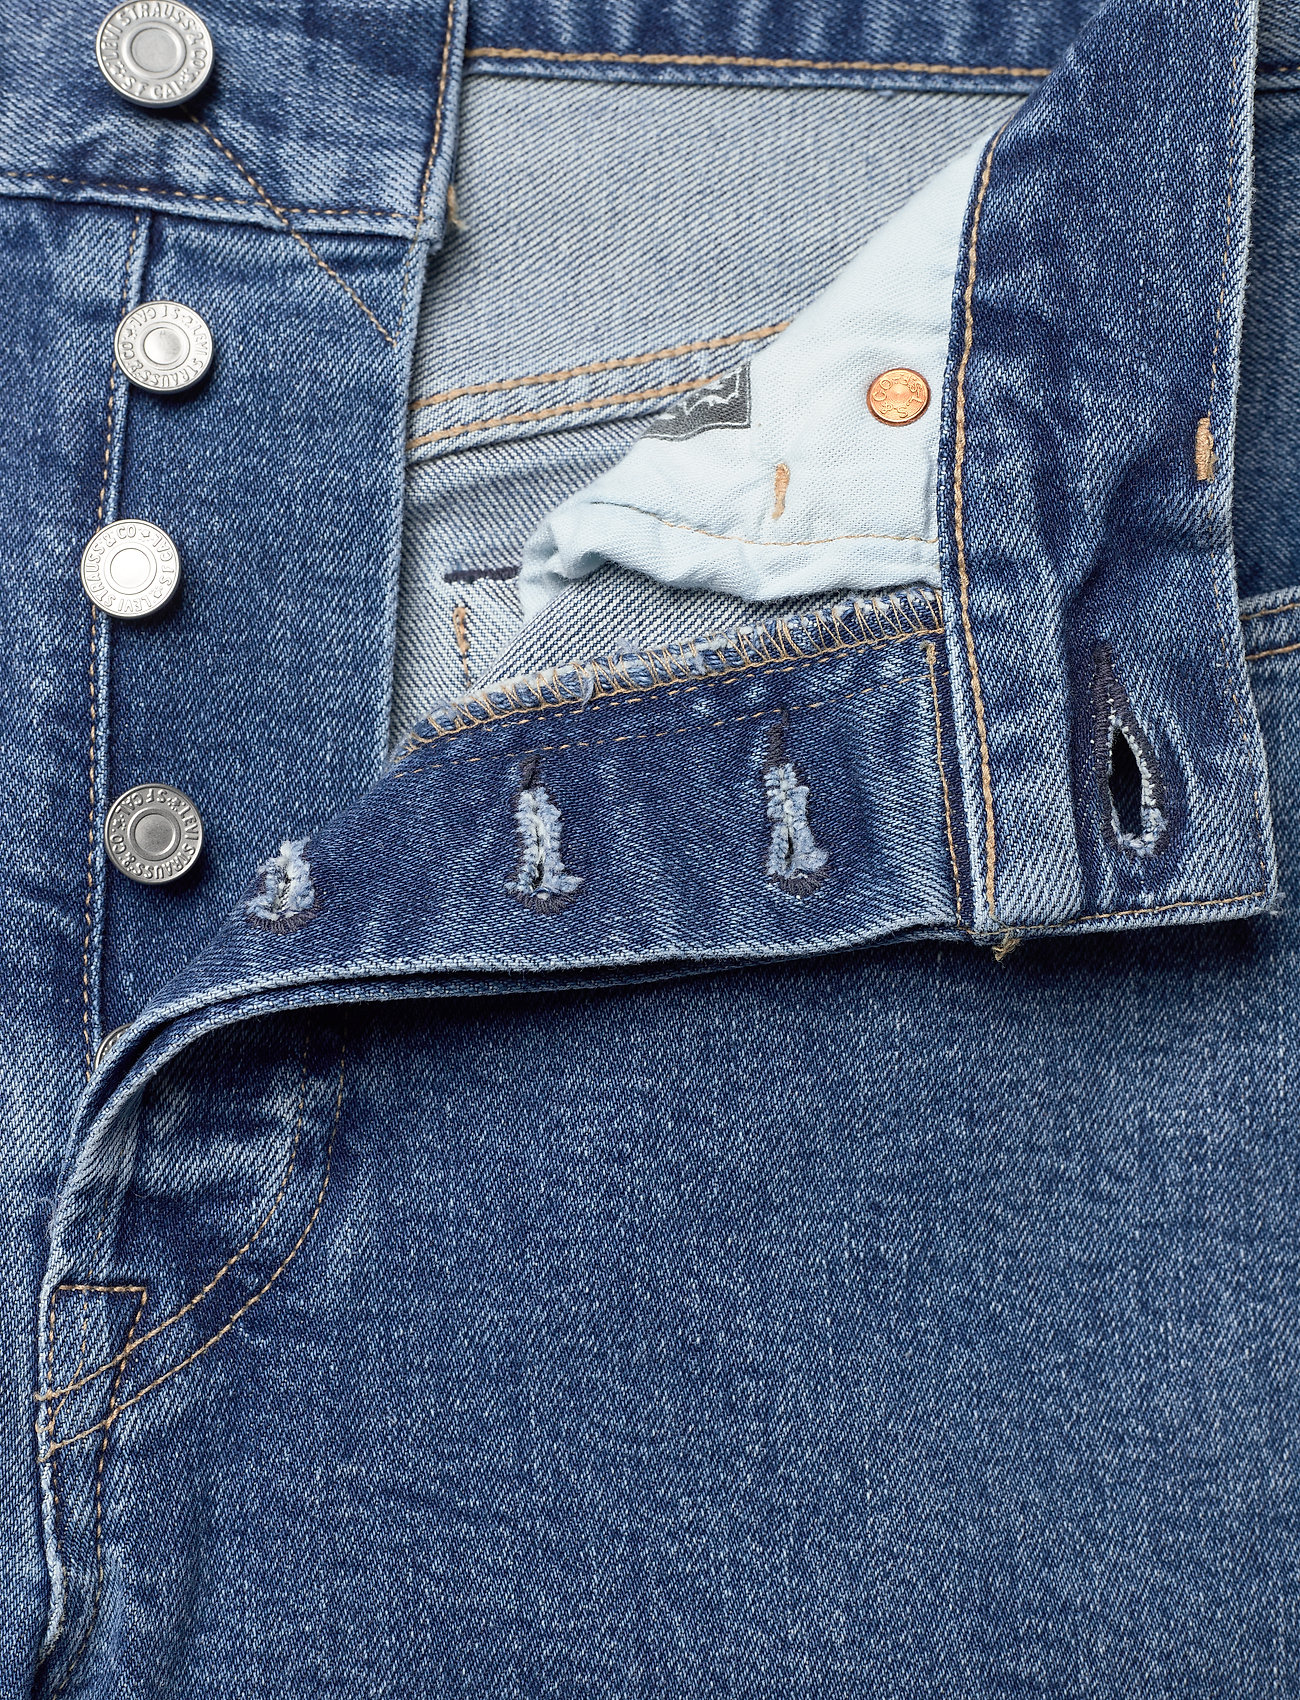 Levi's Made & Crafted - 501 CROP LMC CLIFFSIDE - straight regular - med indigo - worn in - 3